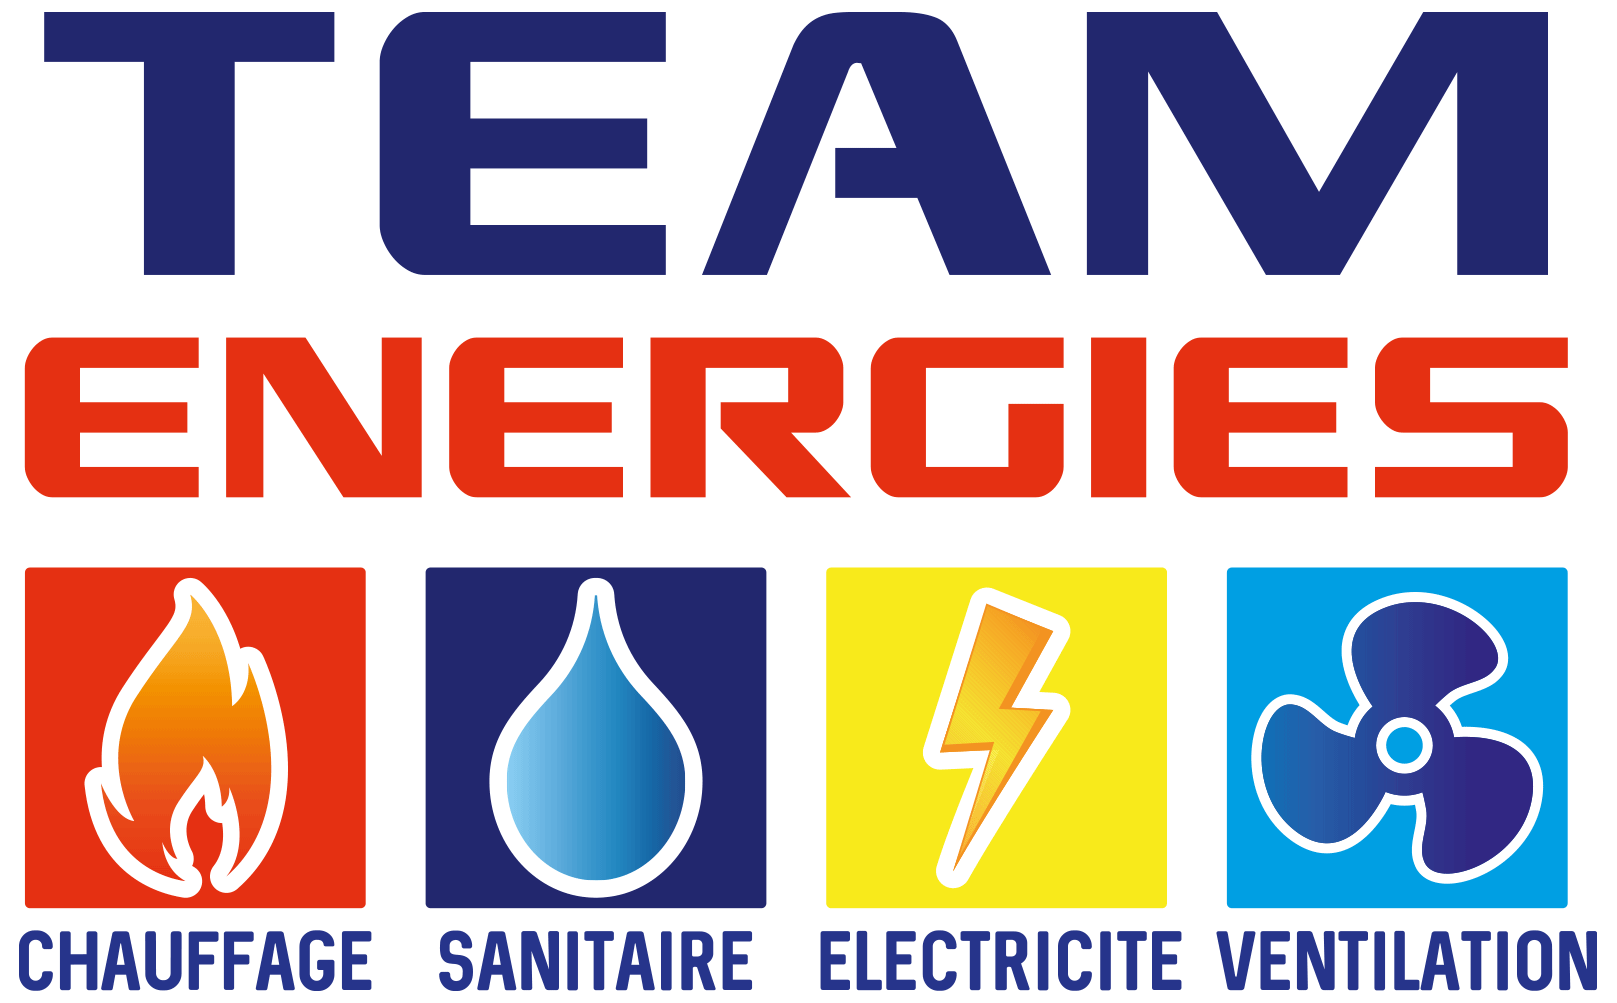 Carrelage Design baudry carrelage : 100+ [ Chauffage Sanitaire Electricite Ventilation ...